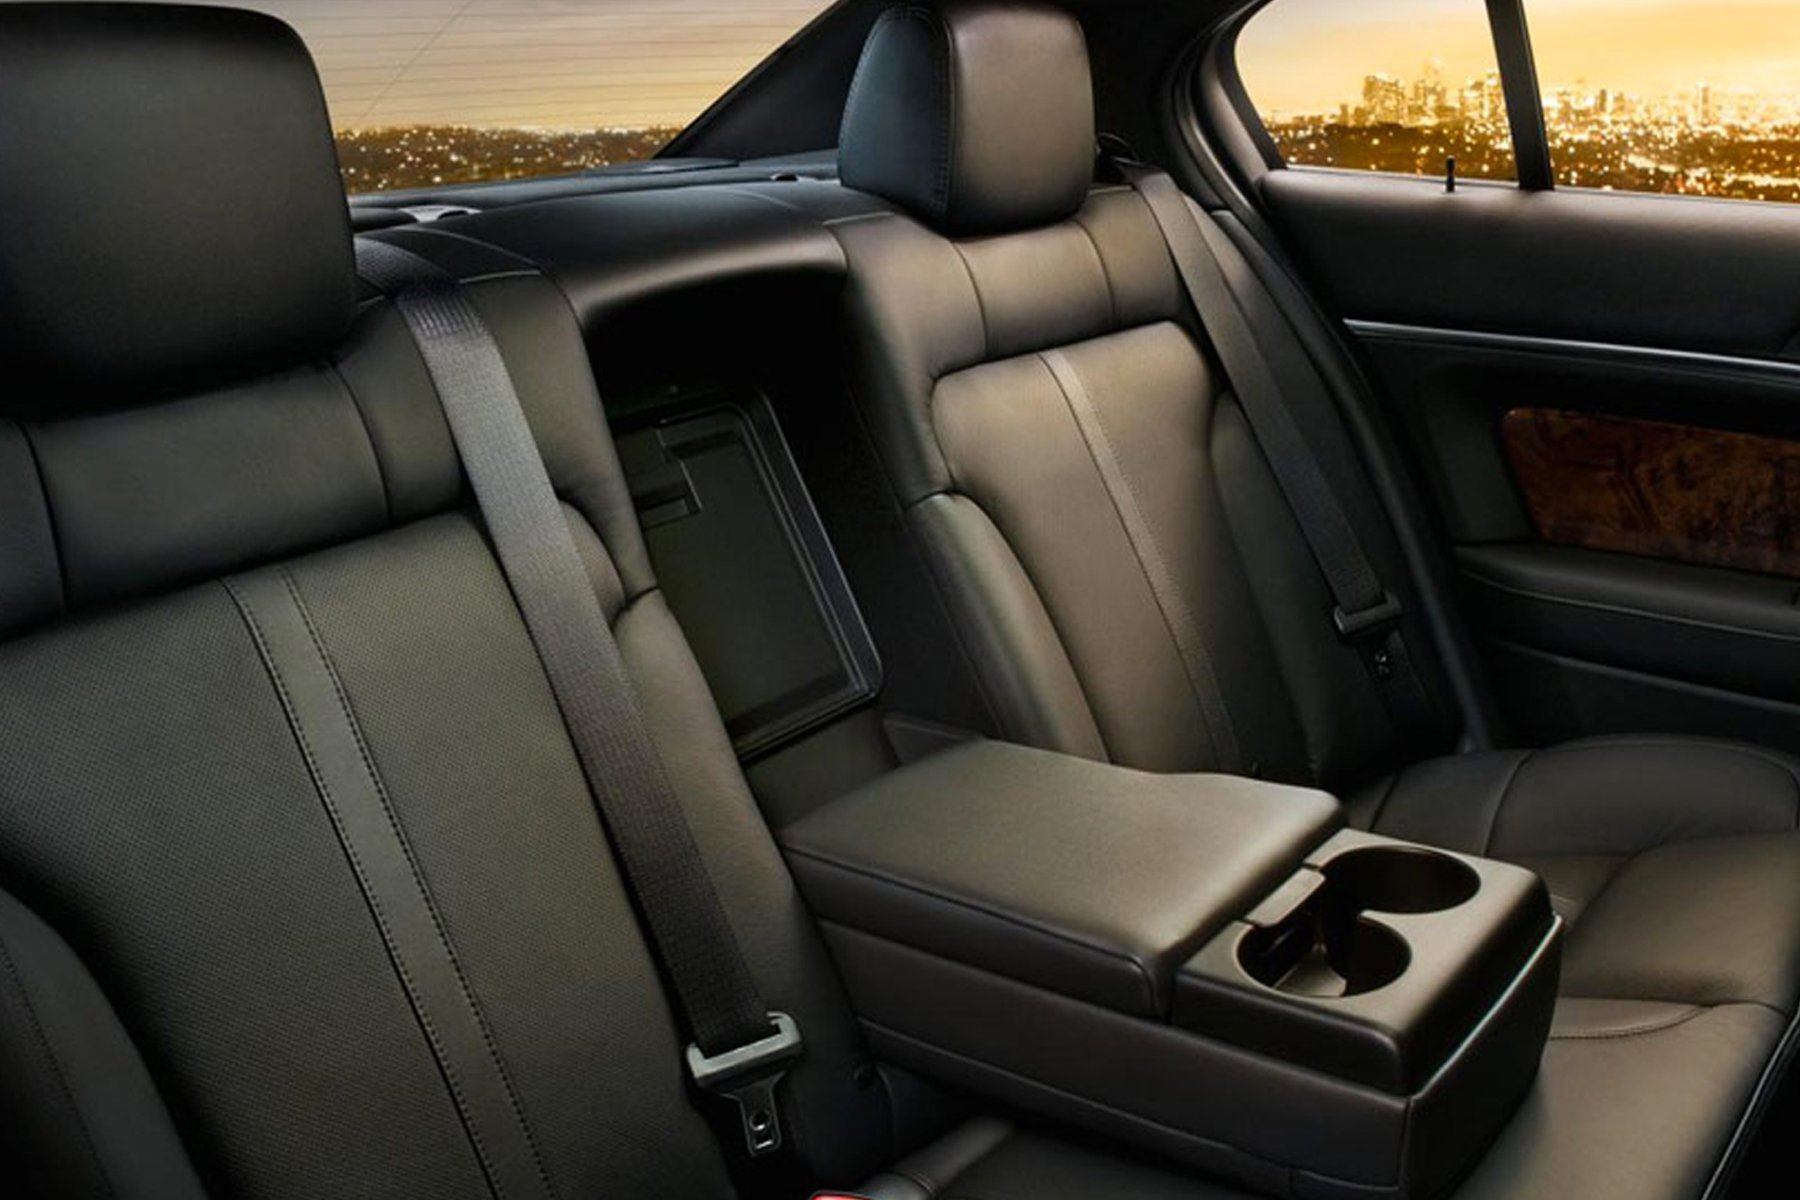 Skyline Chicago Limo Cars Luxury Fleet Black Lincoln MKS Interior October 2020